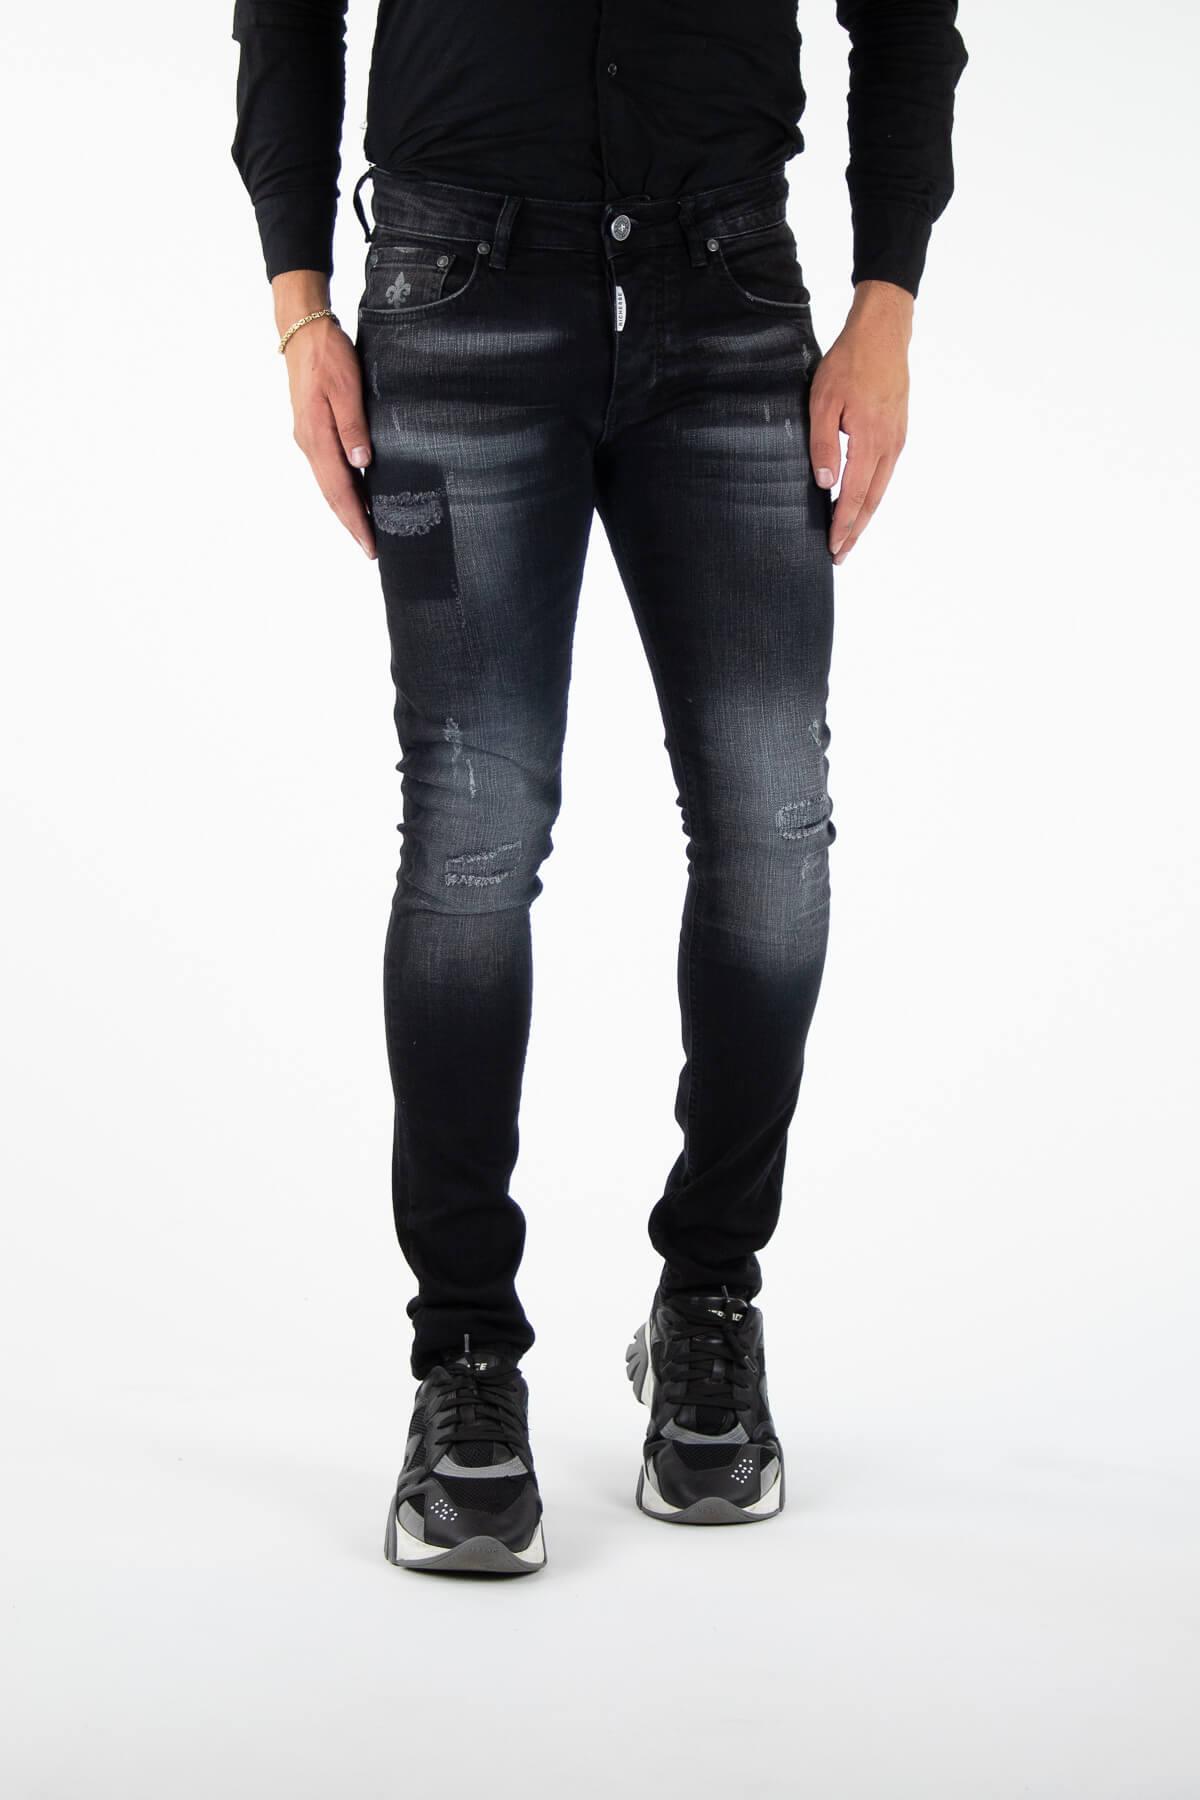 Novara Black Jeans-1